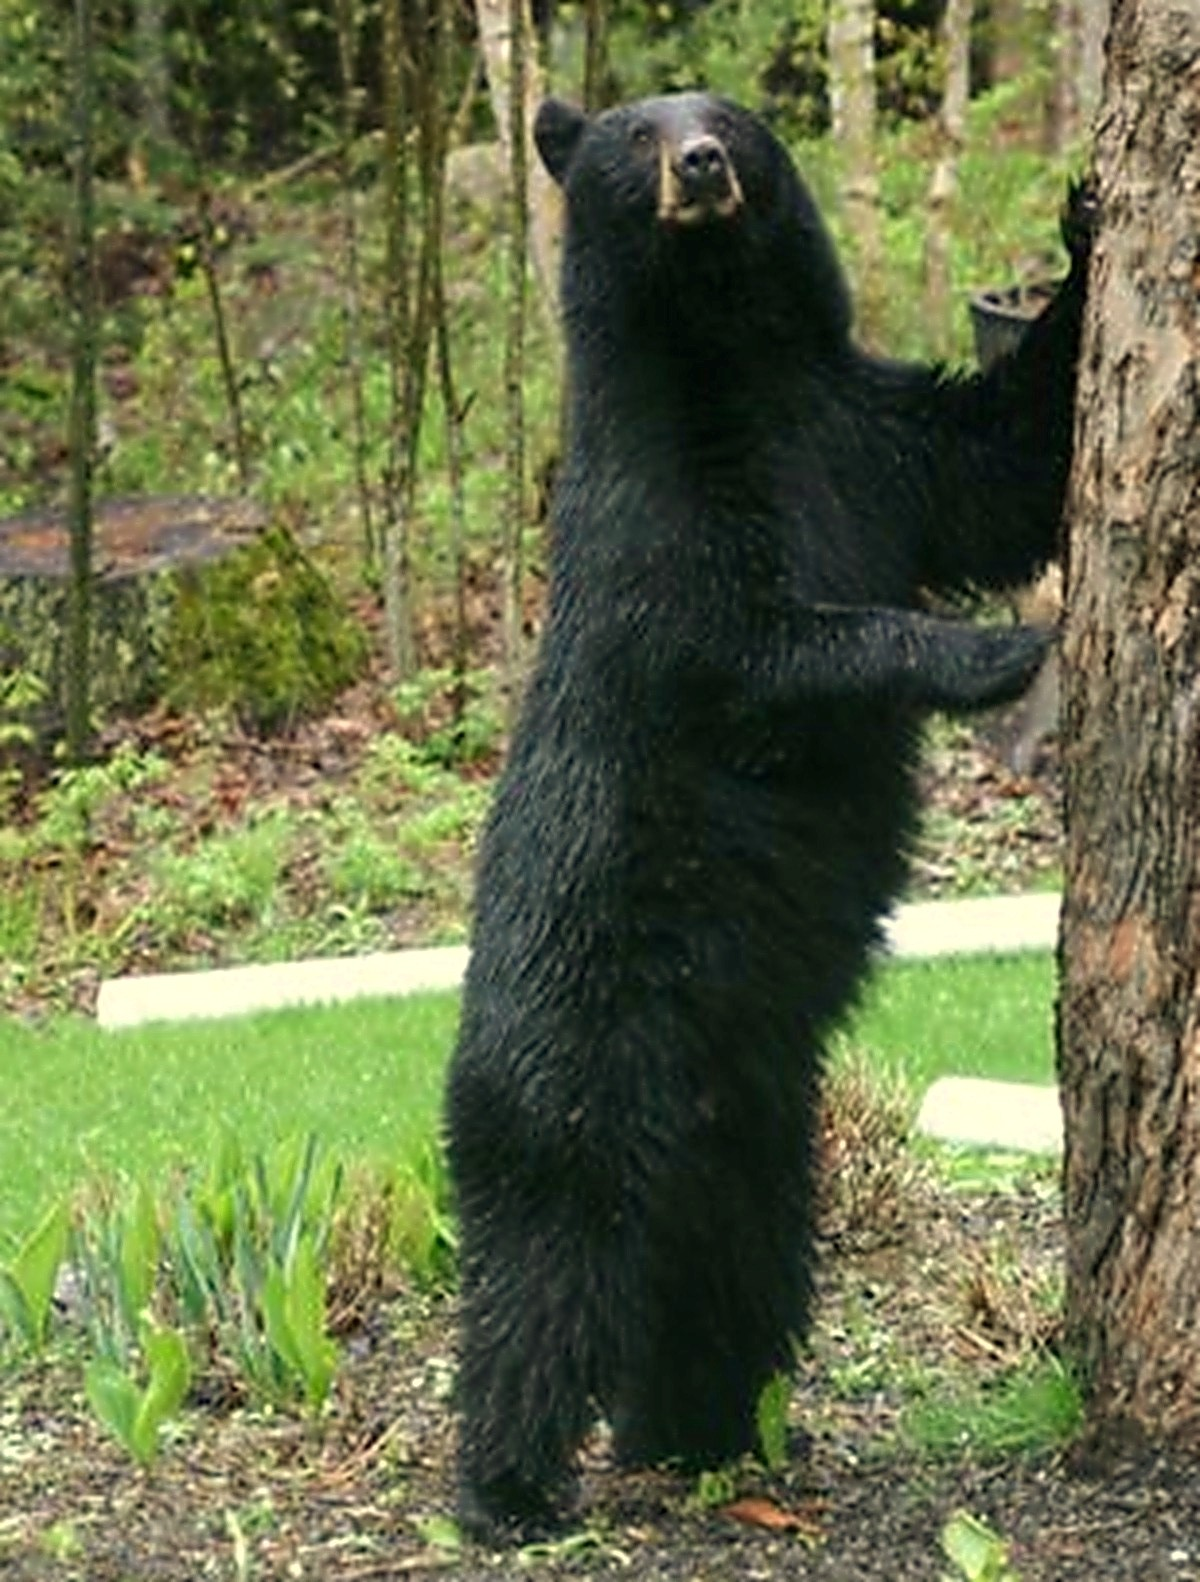 Man Climbs Tree to Avoid Bear, Bear Follows